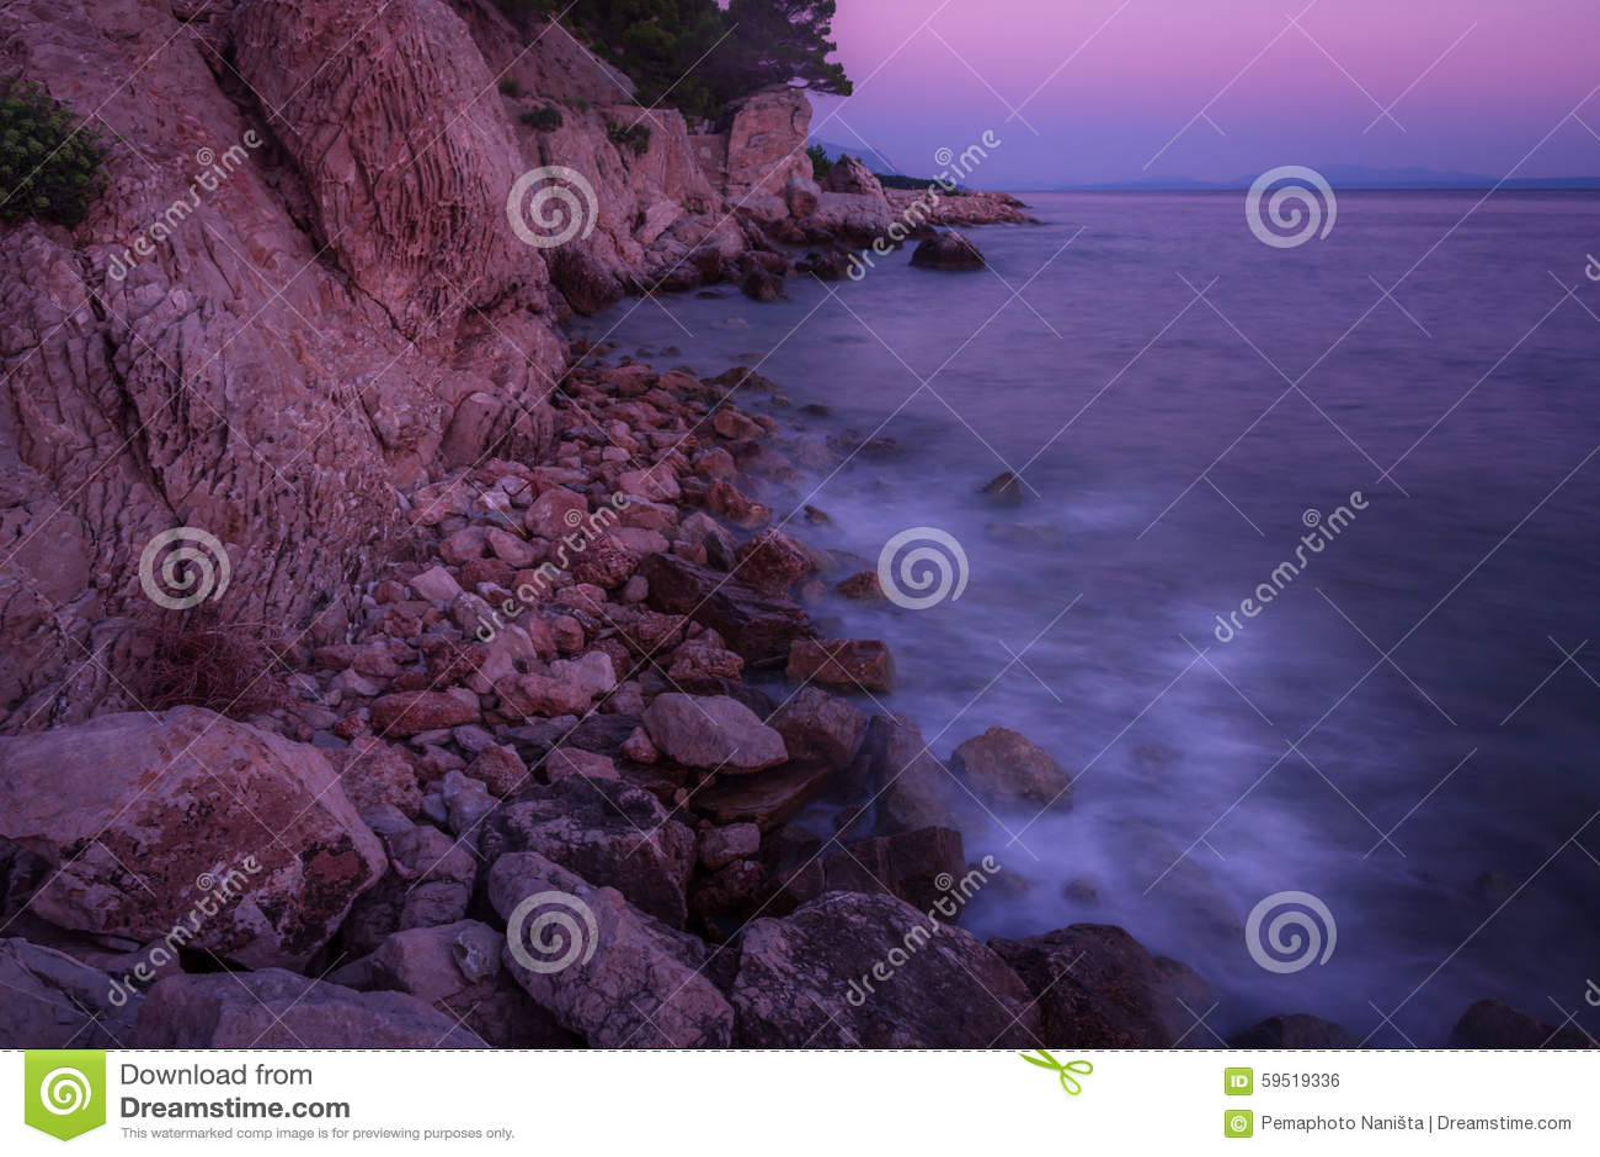 Sunset Groundwater